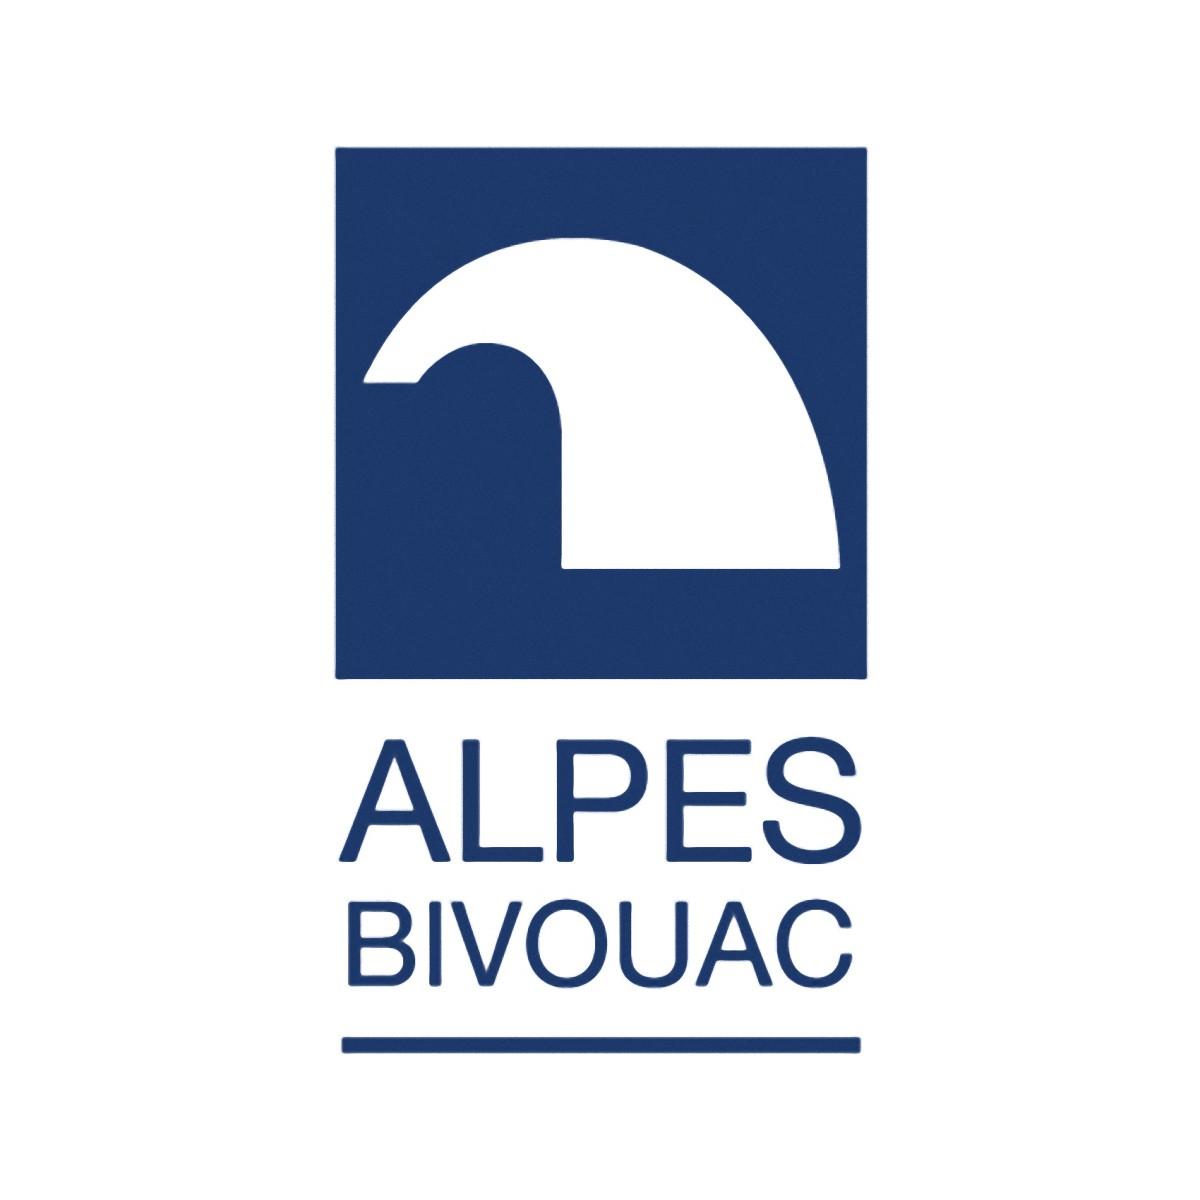 Alpes-Bivouac